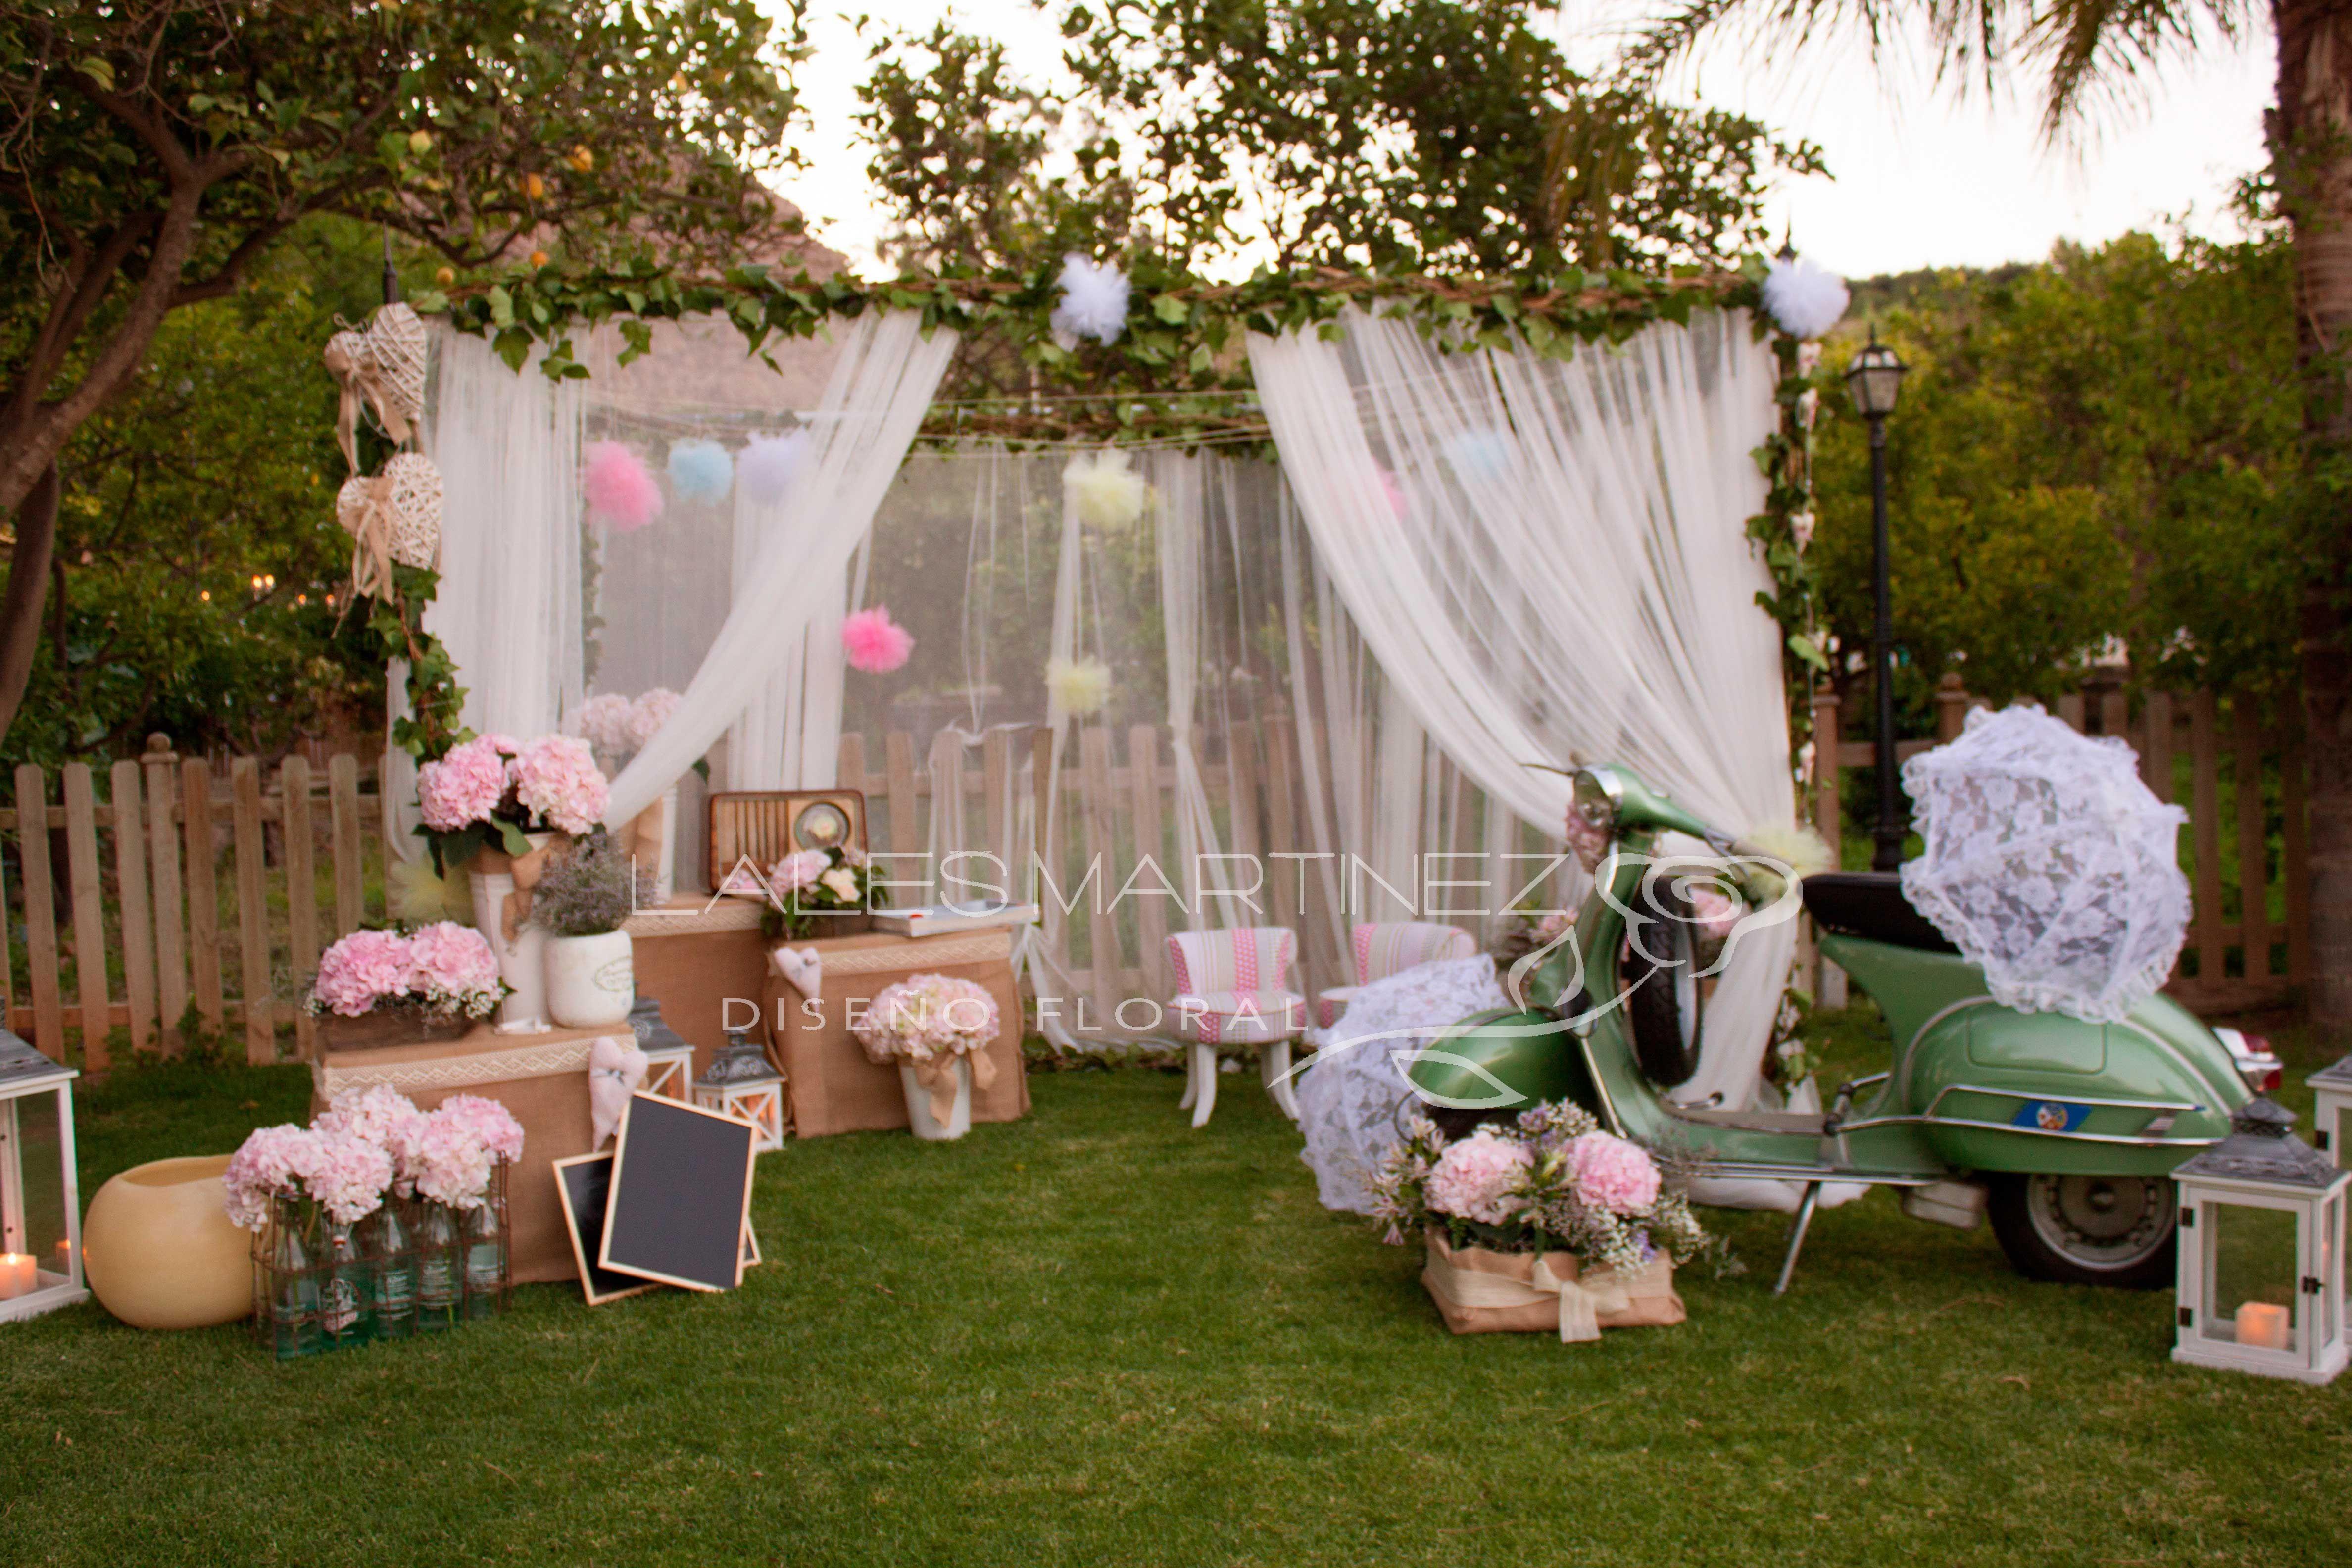 59 photocalls para bodas ideas divertidas y originales - Ideas divertidas para fiestas ...